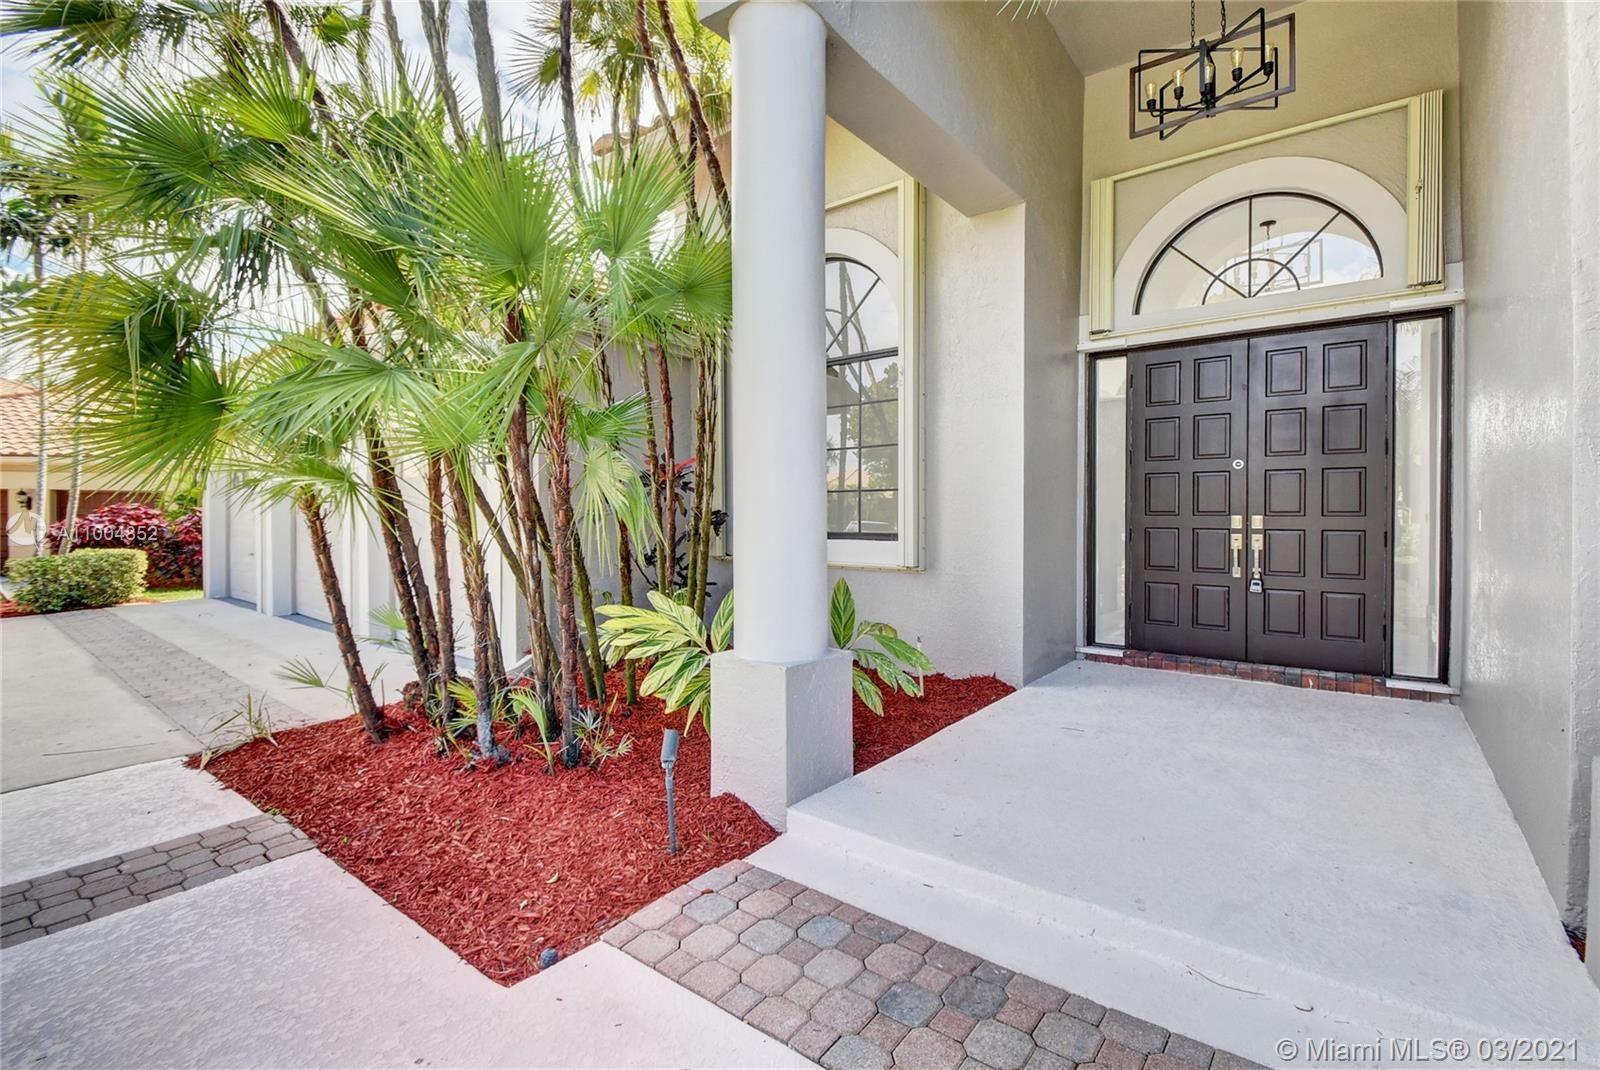 Photo of 680 Palm Blvd, Weston, FL 33326 (MLS # A11004852)